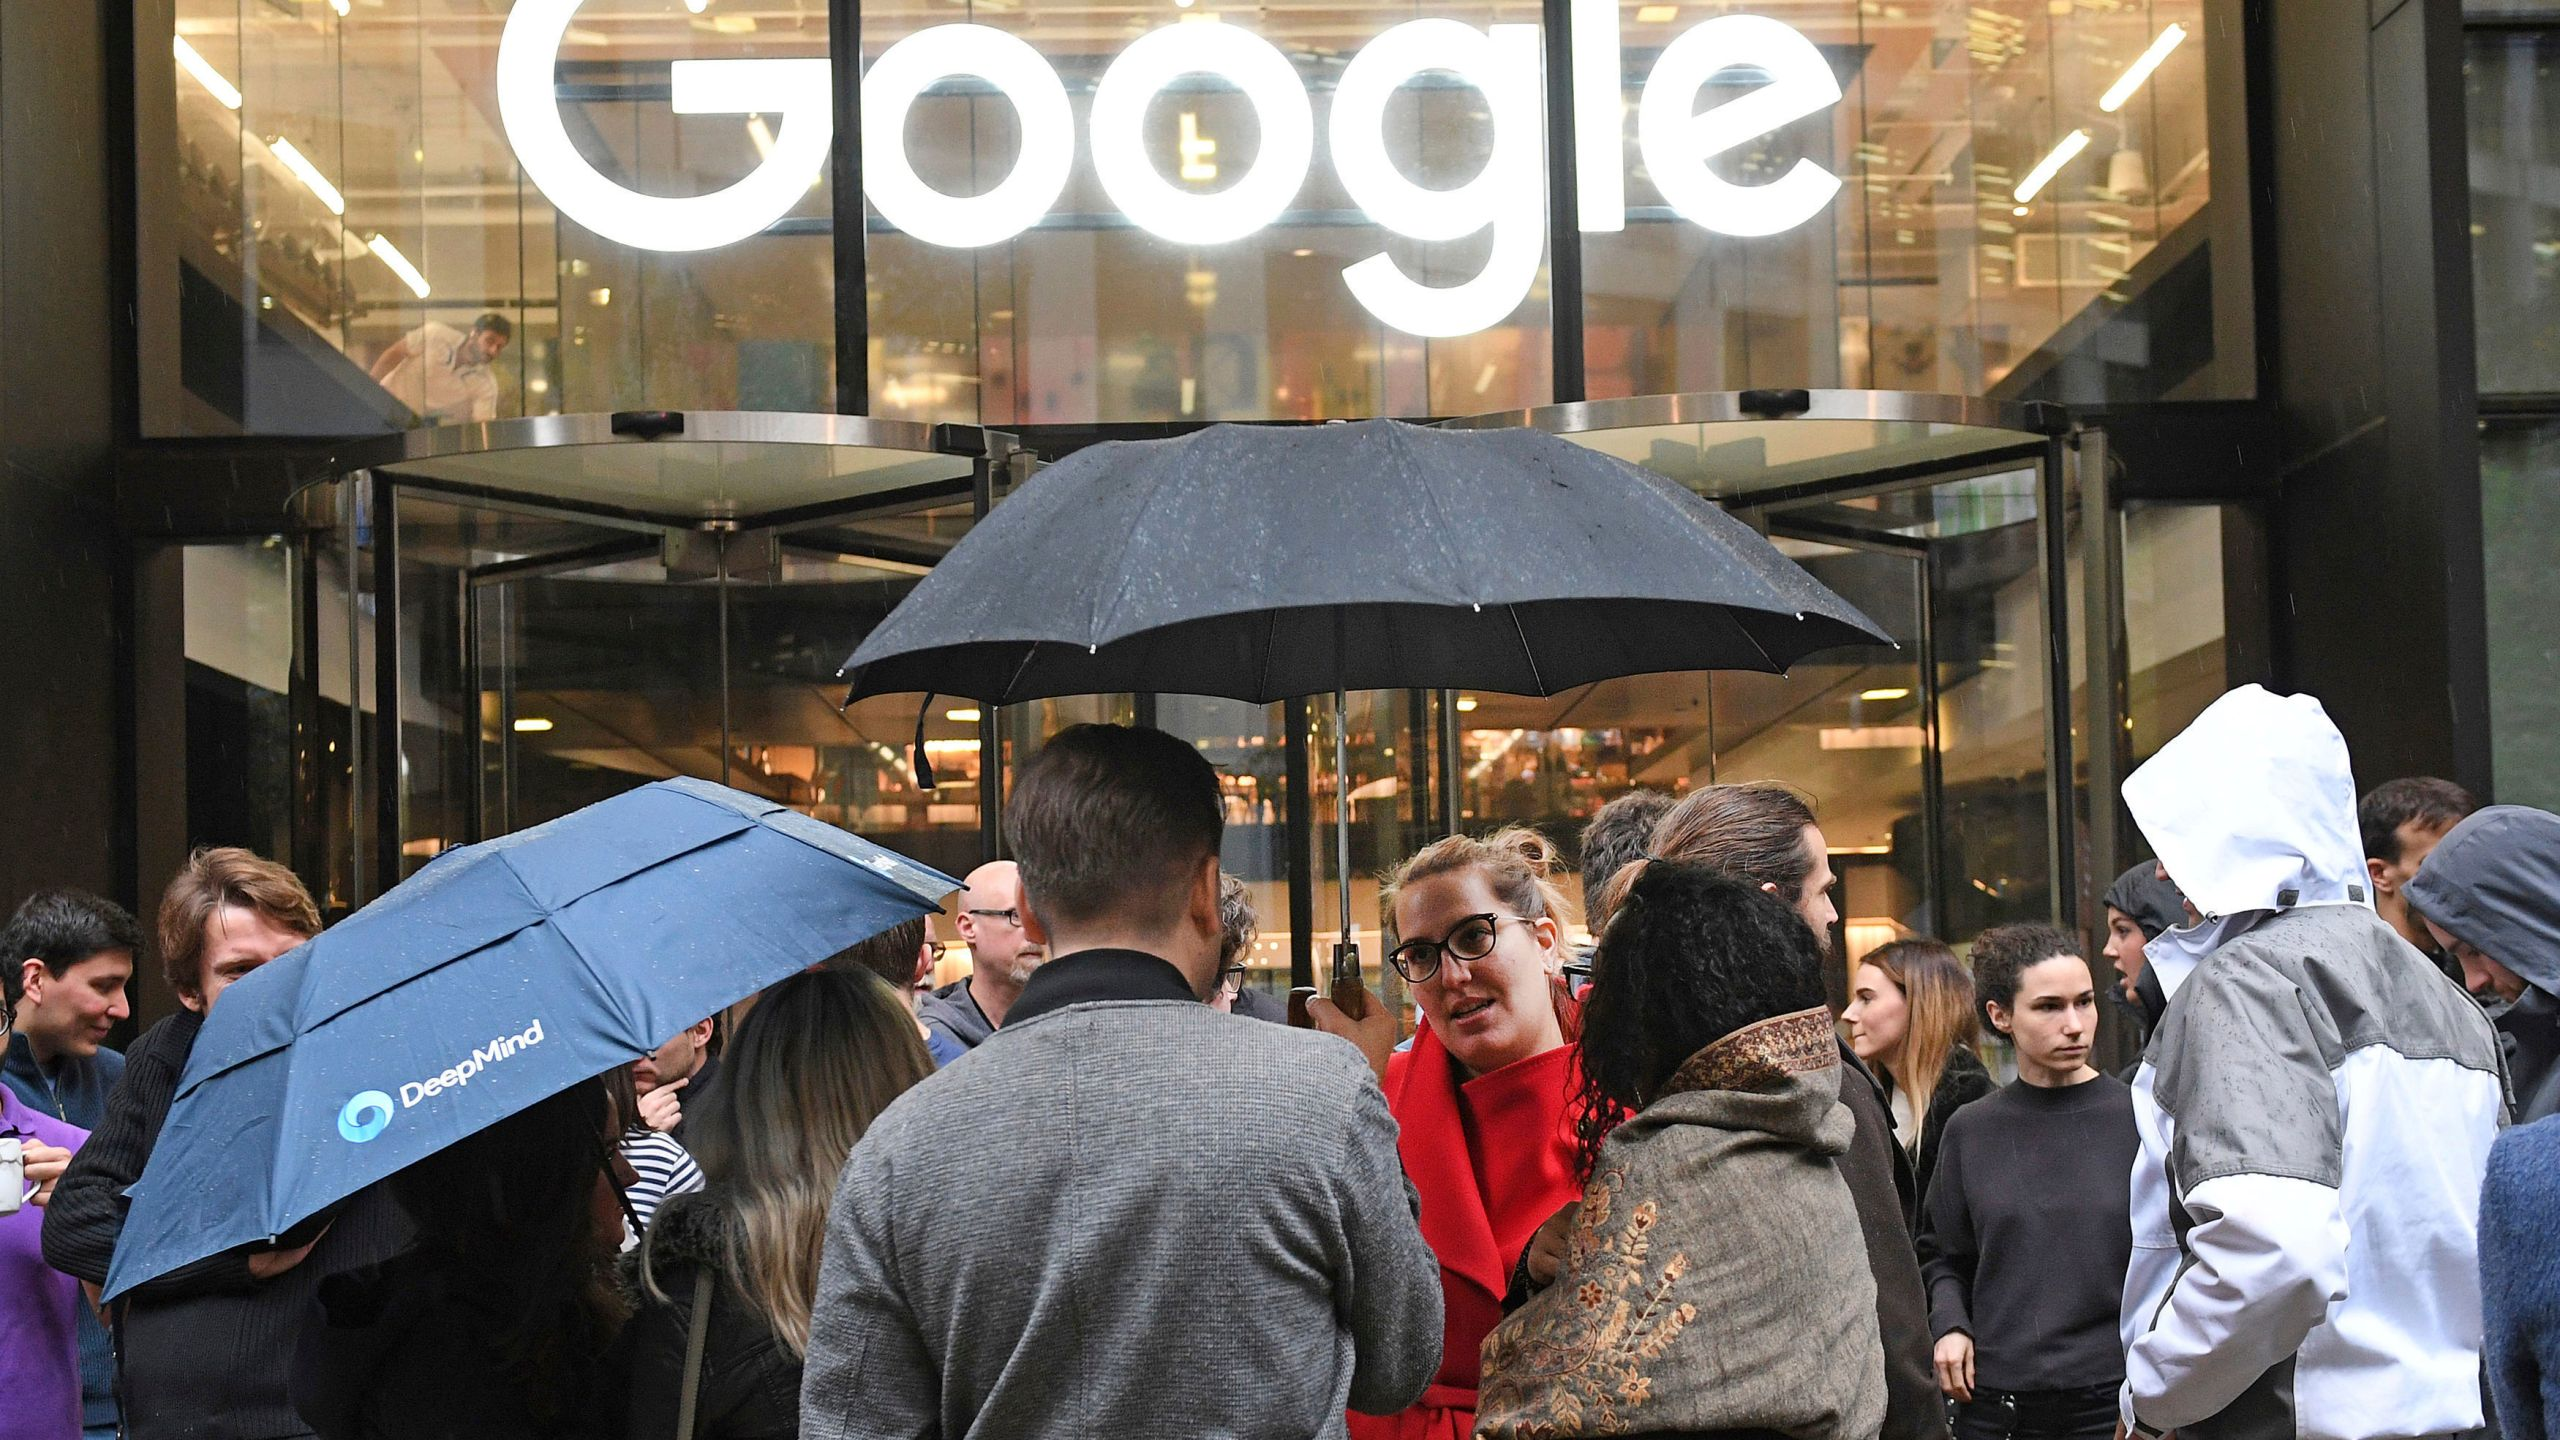 Britain_Google_Walkout_27043-159532.jpg76328236